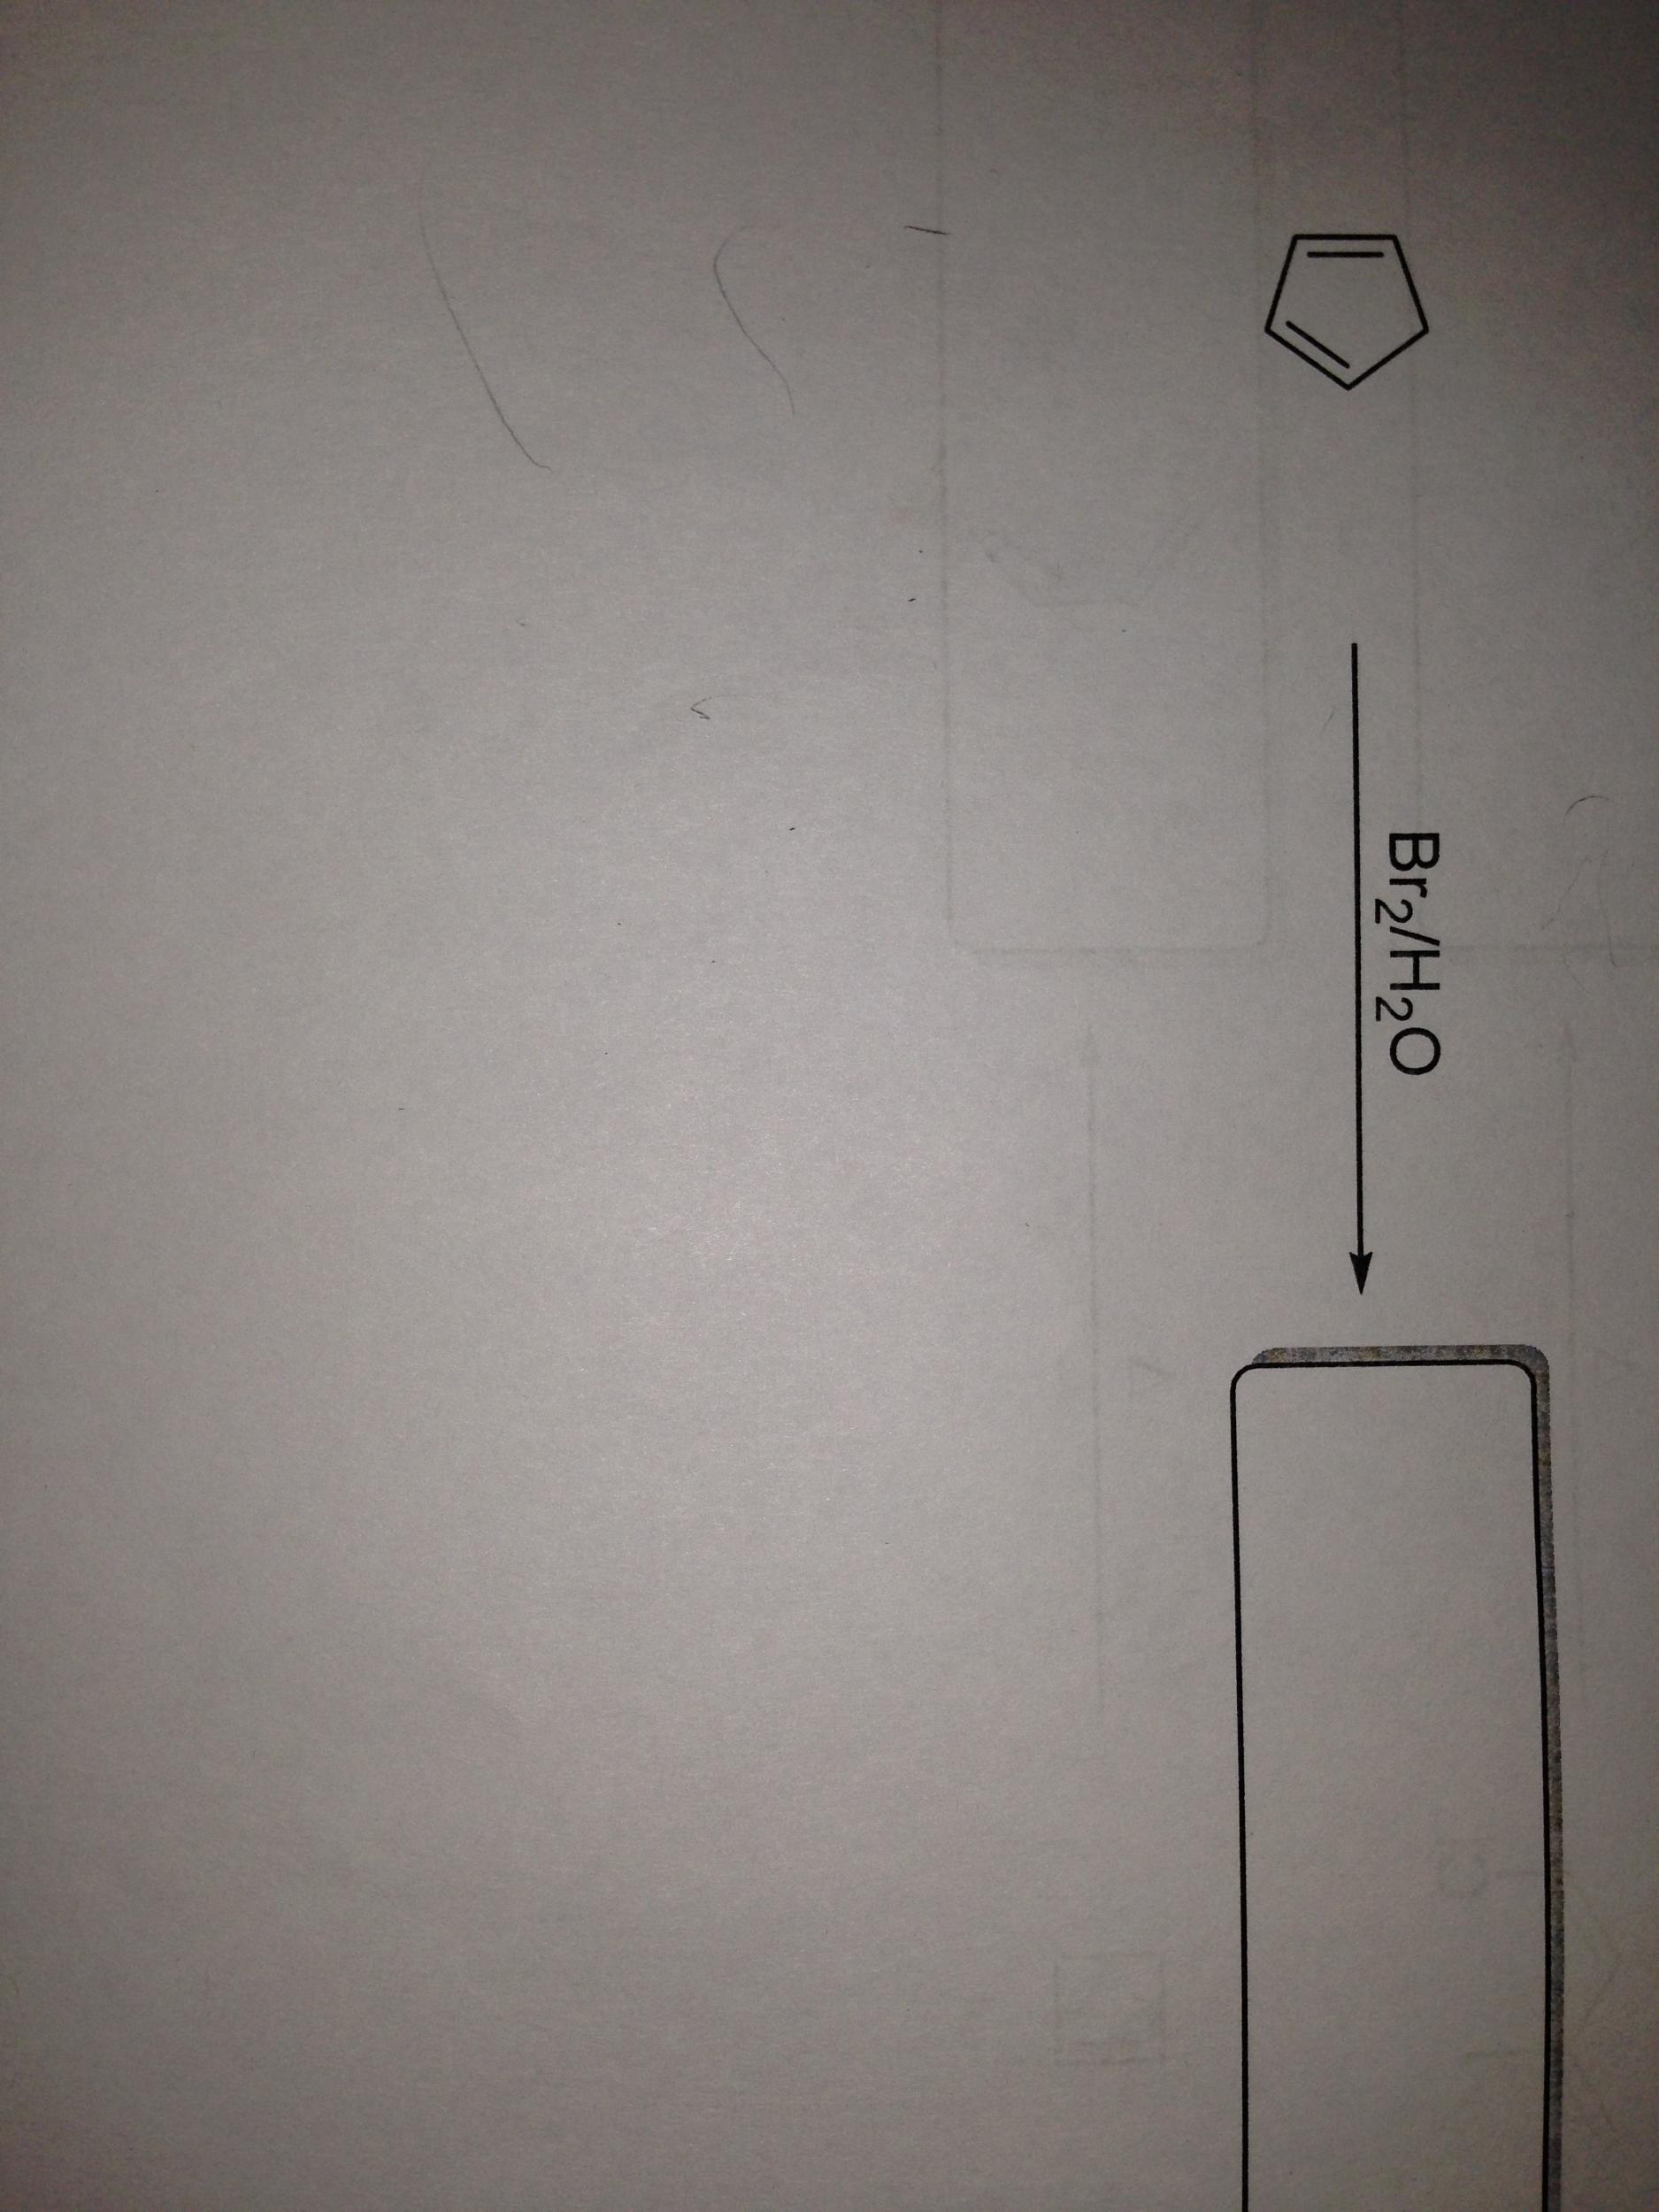 Chemistry Archive | January 26, 2014 | Chegg.com